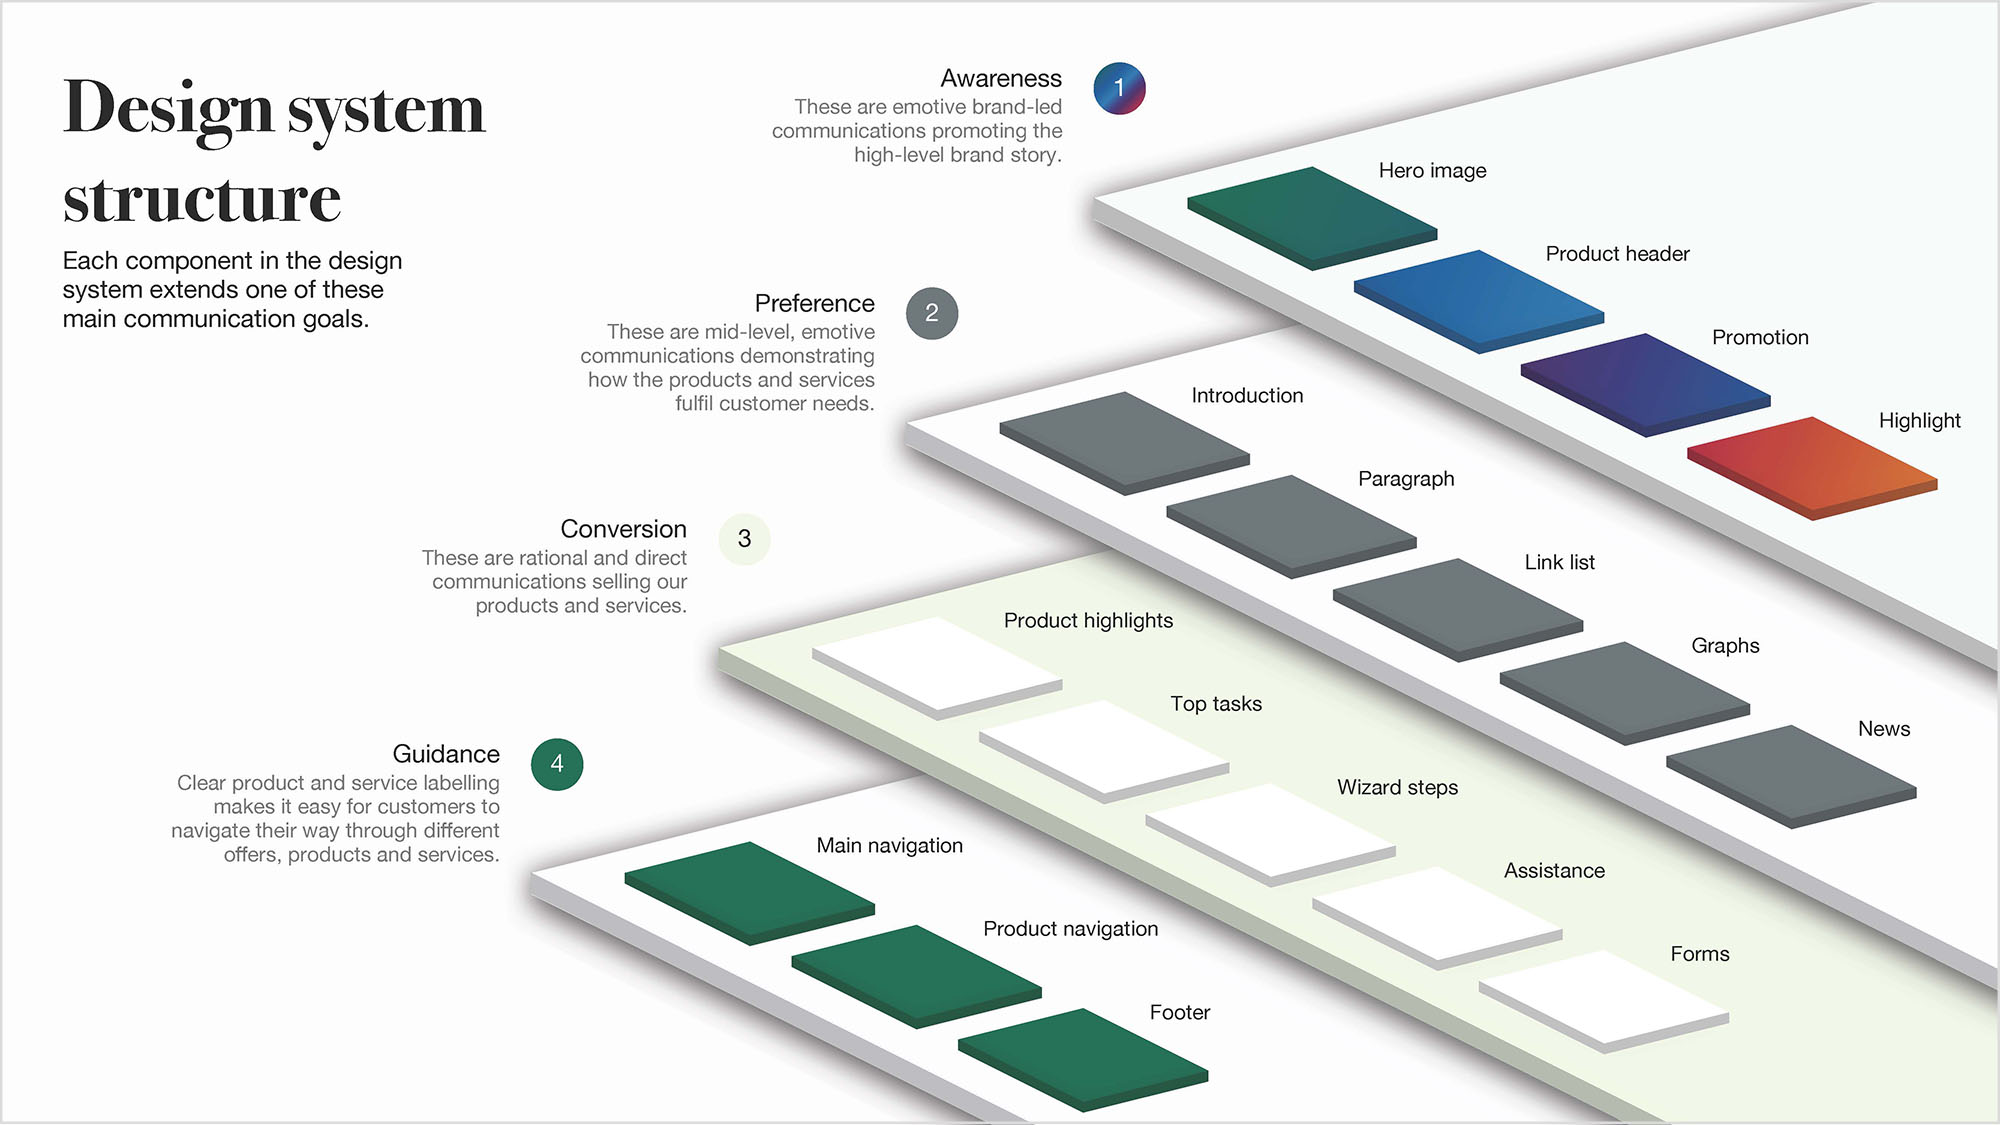 Design System Structure